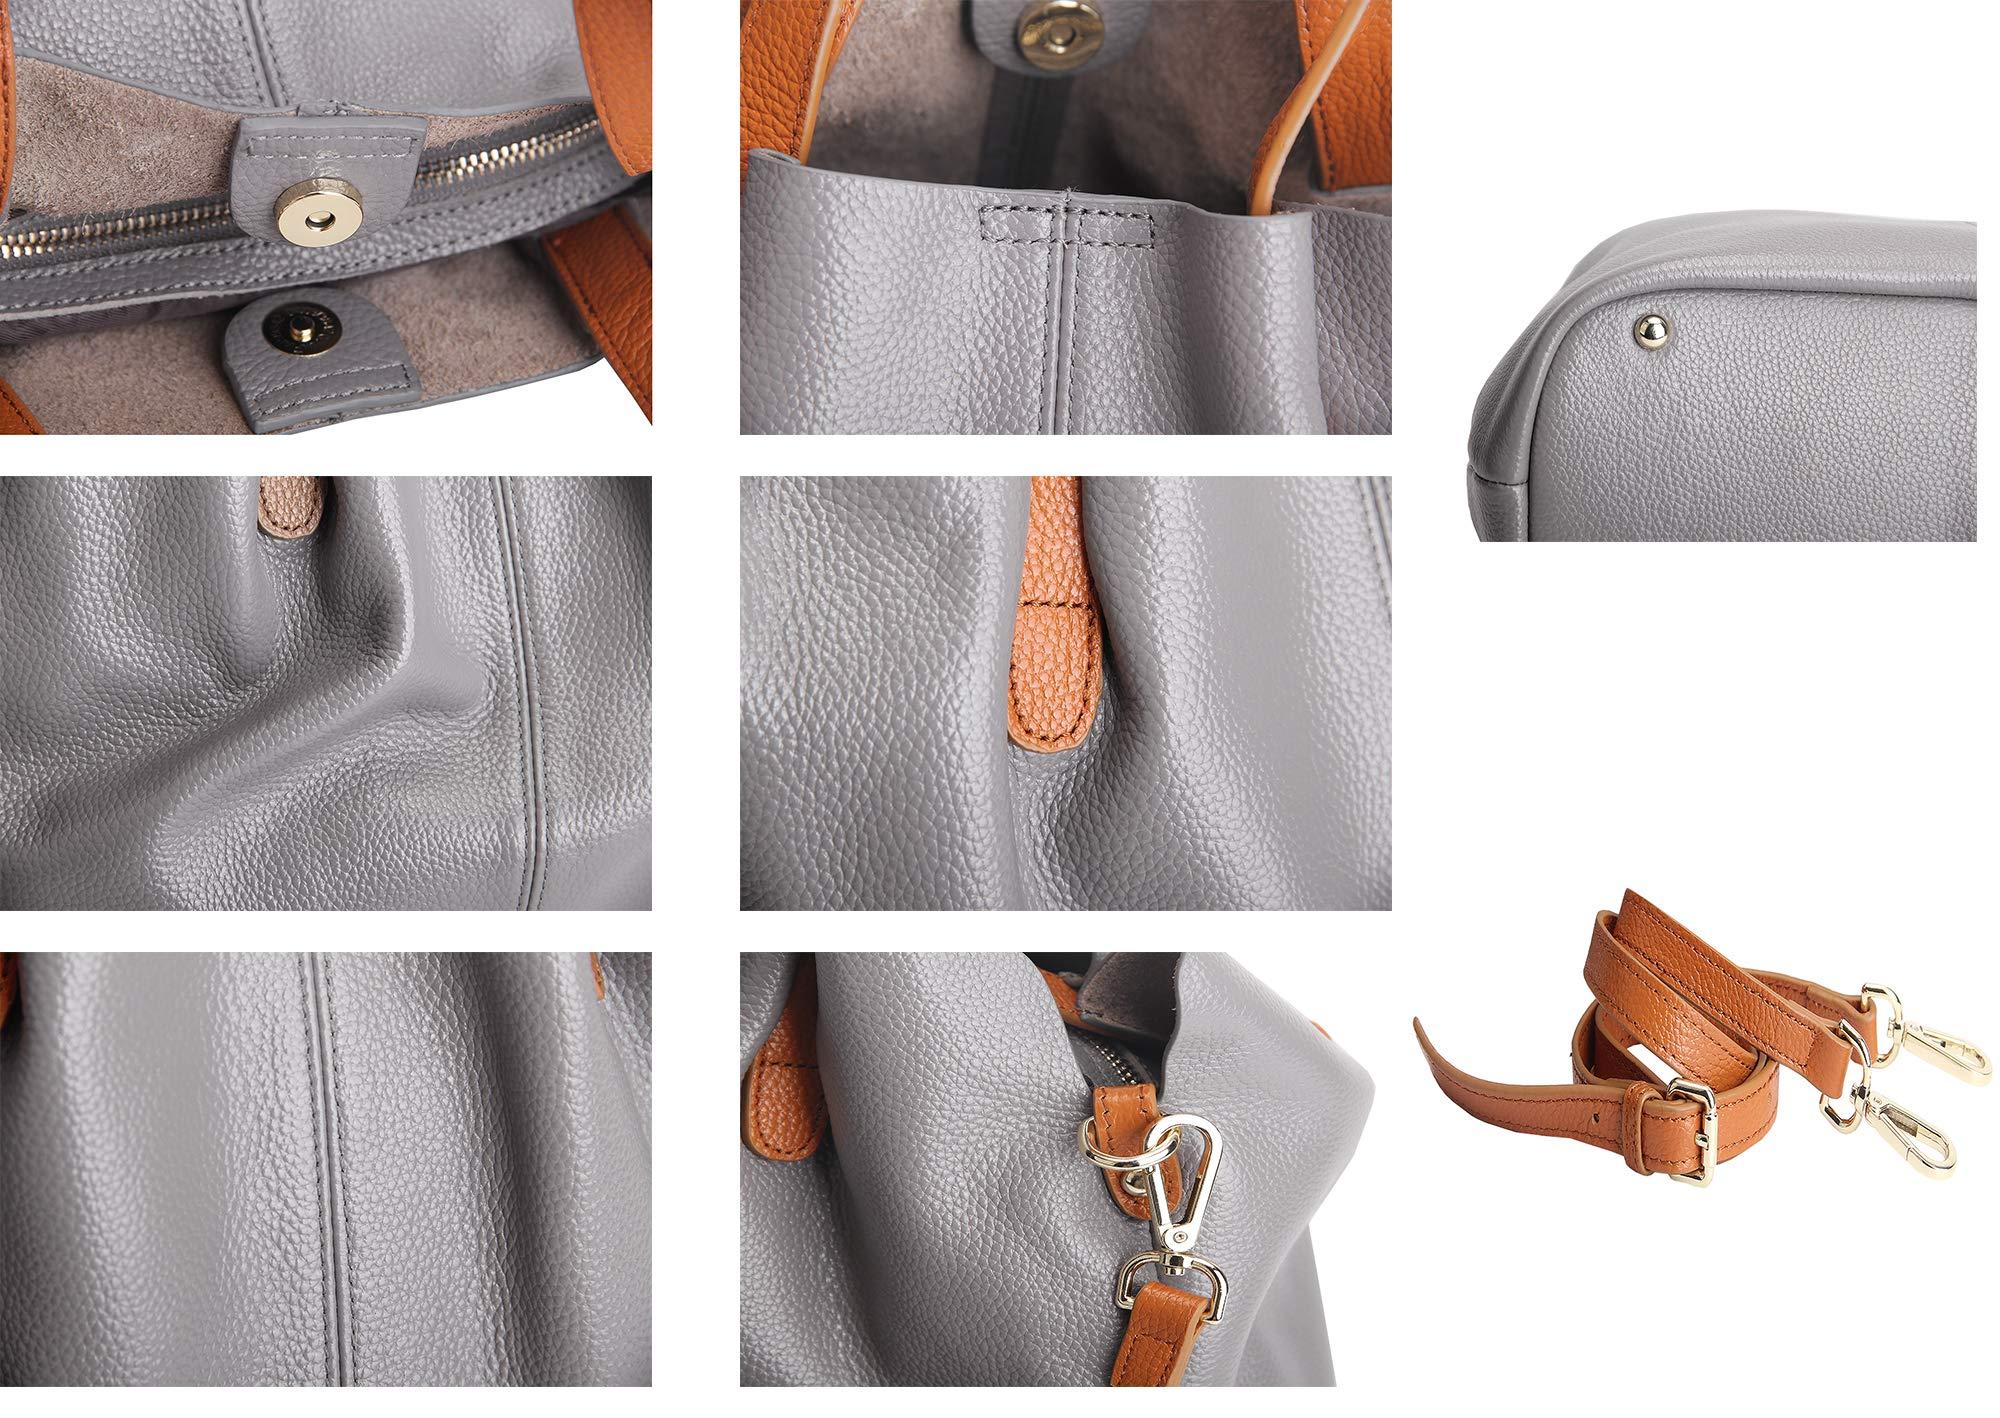 Molodo Womens Satchel Hobo Top Handle Tote Geuine Leather Handbag Shoulder Purse,Black,Large by Molodo (Image #7)